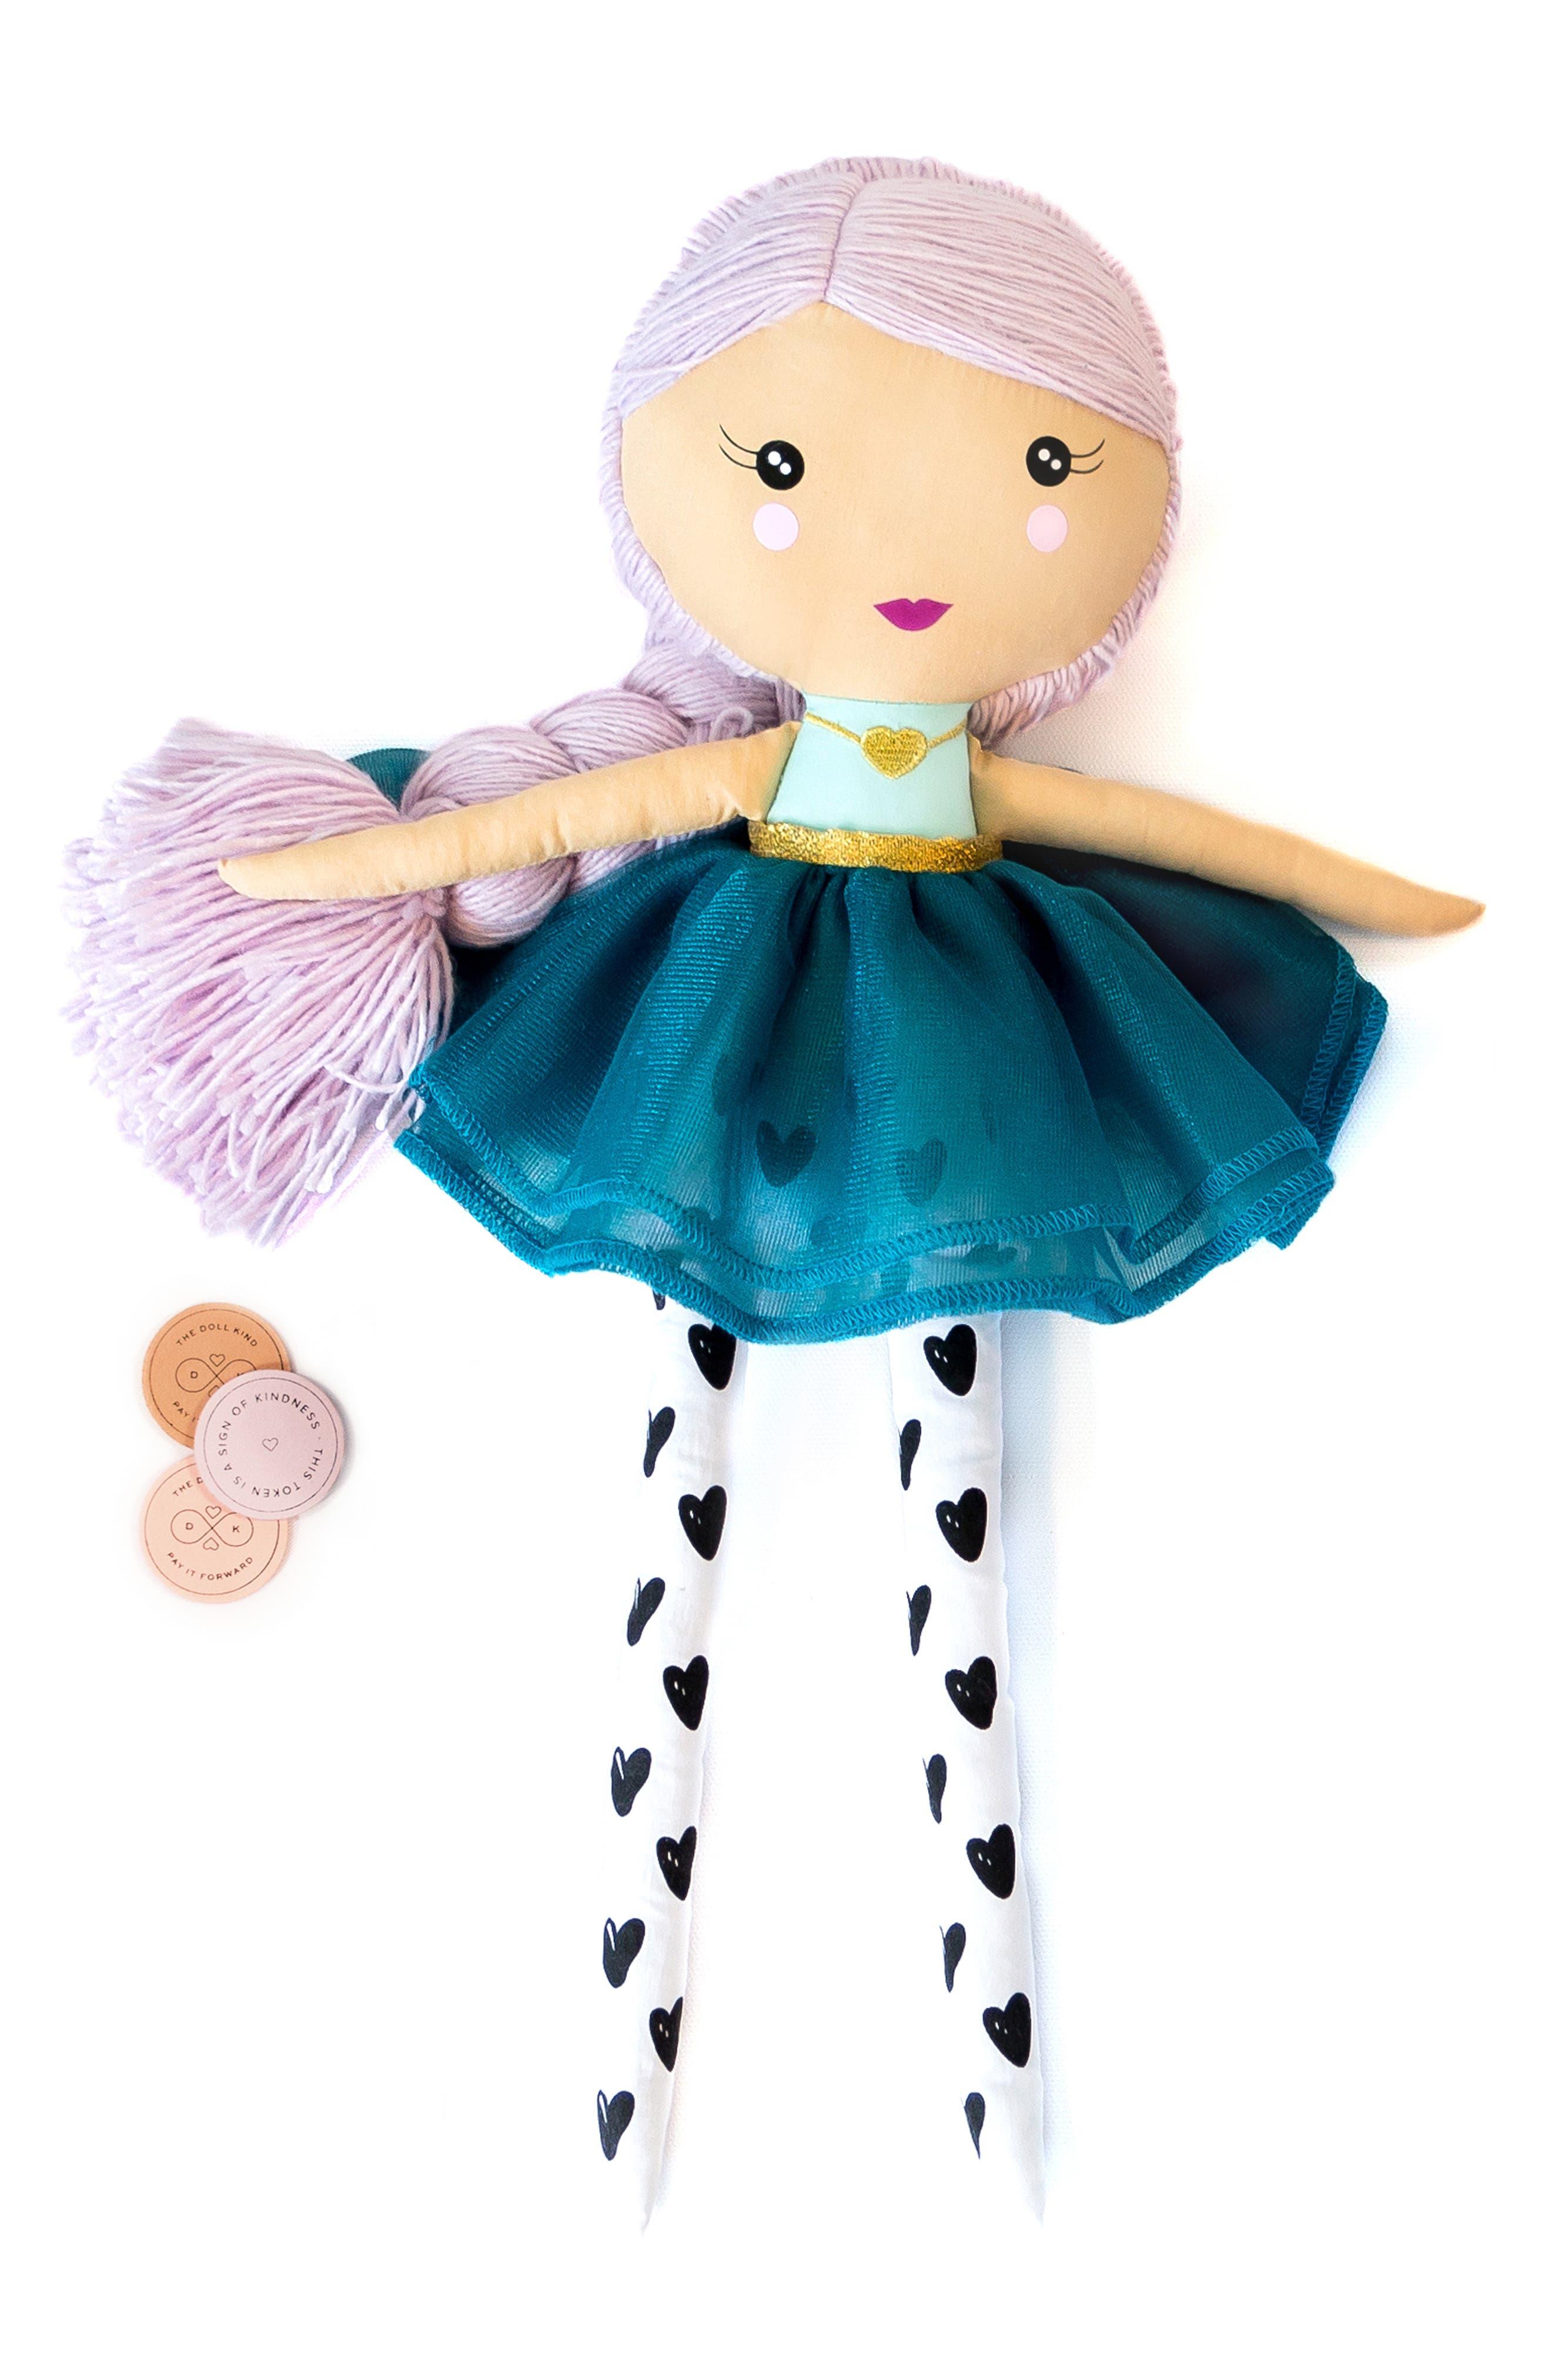 Girls Kind Culture Co The Fair Doll  Kindness Kit Set